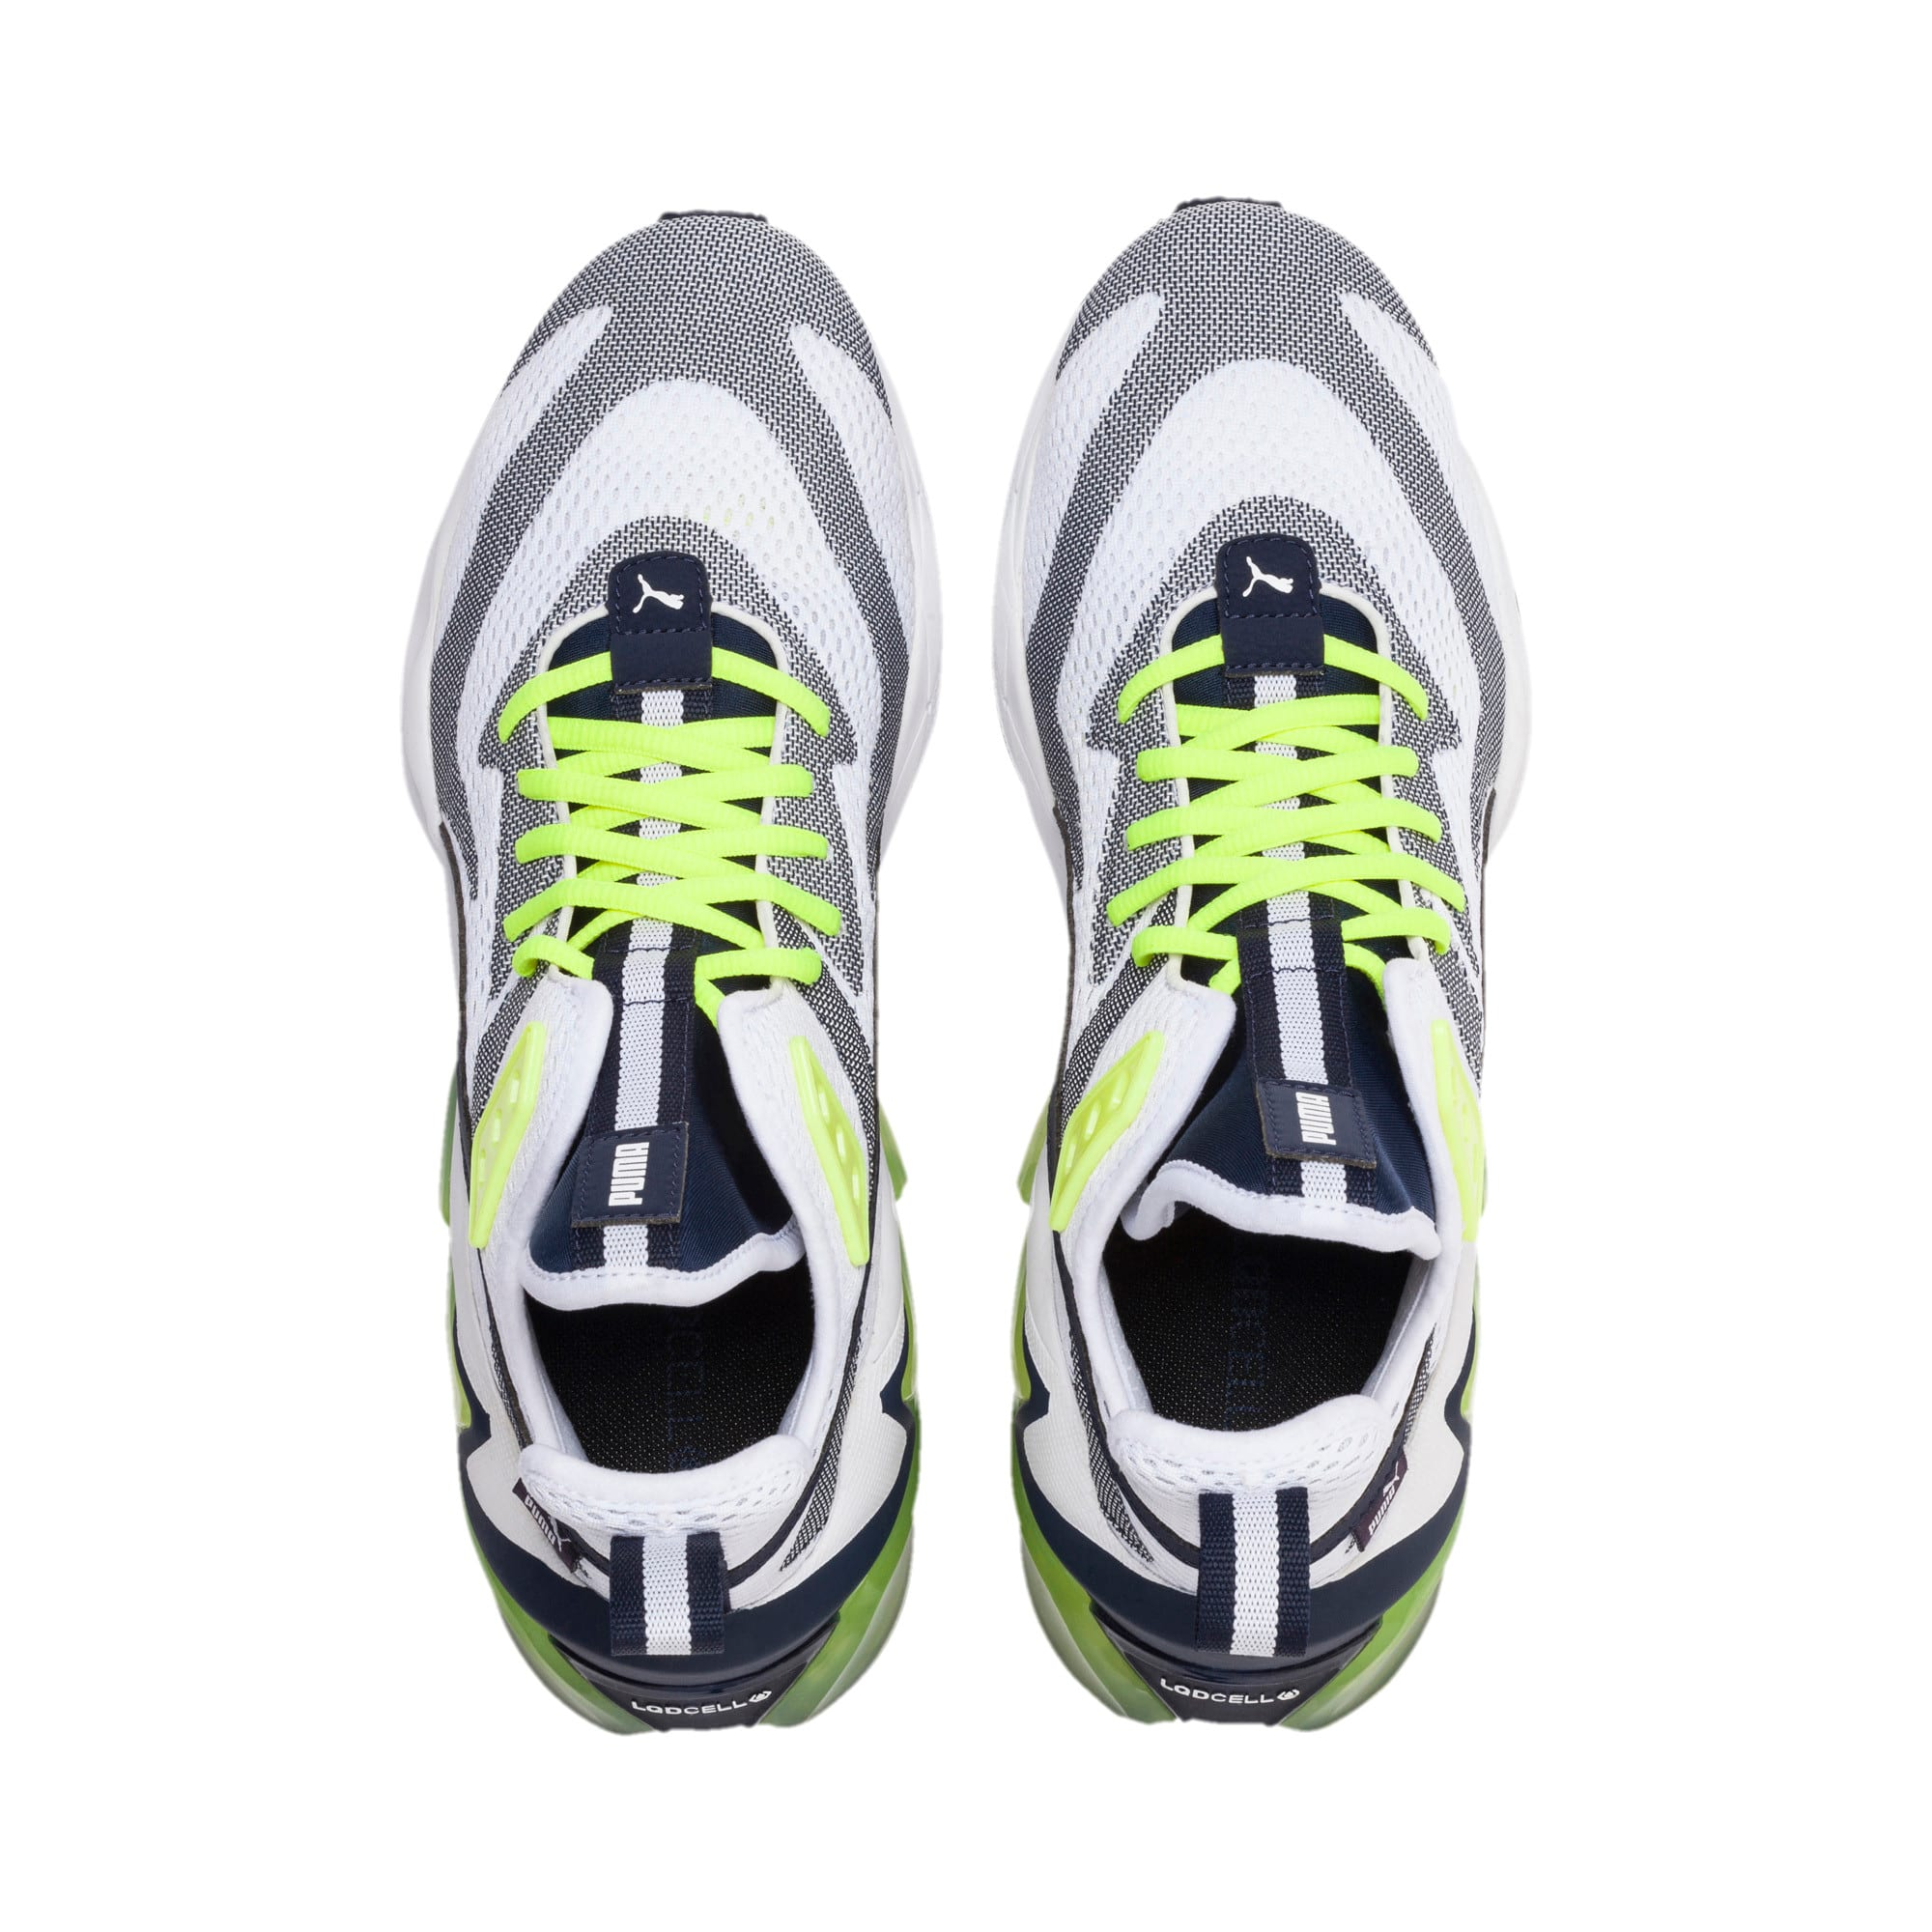 Thumbnail 7 of LQDCELL Origin Tech Men's Shoes, Puma White-Peacoat, medium